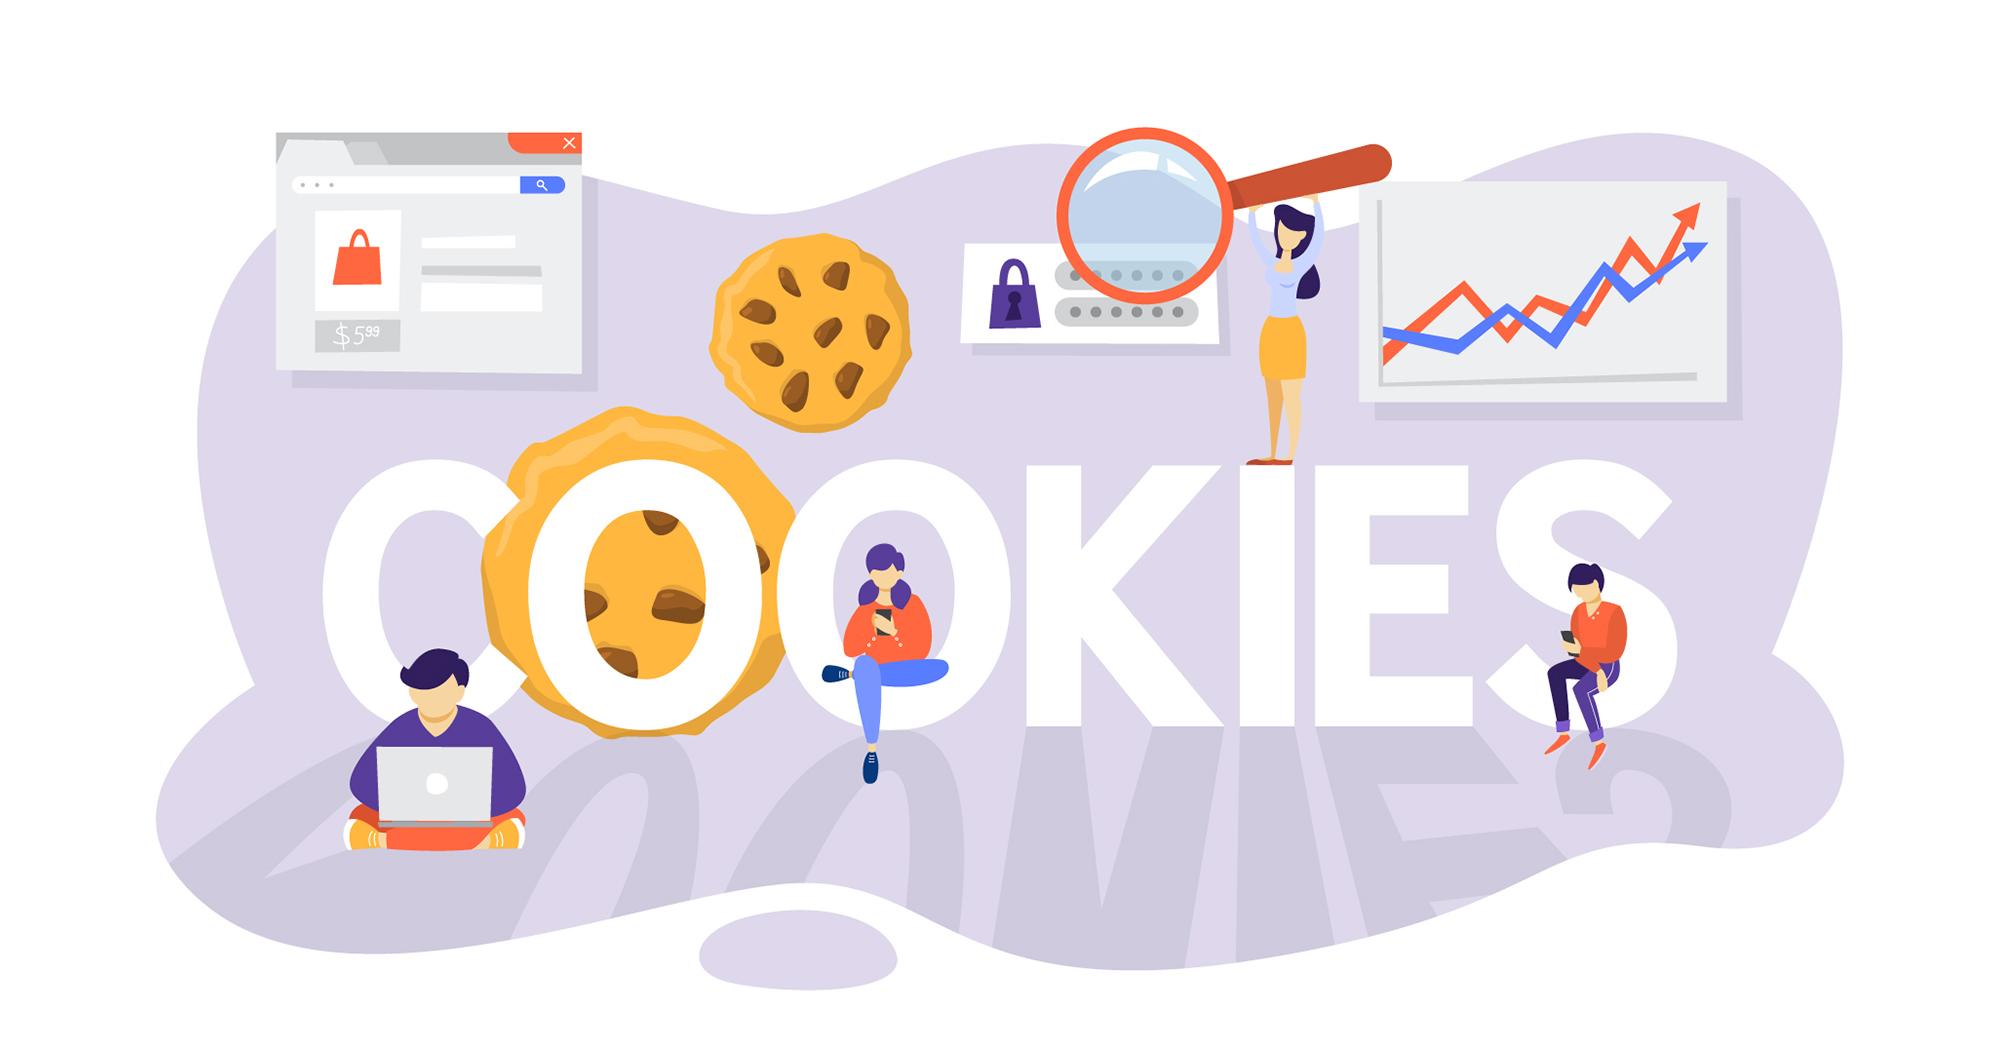 Google、Chromeで2年以内にサードパーティCookieを完全に廃止する計画を発表